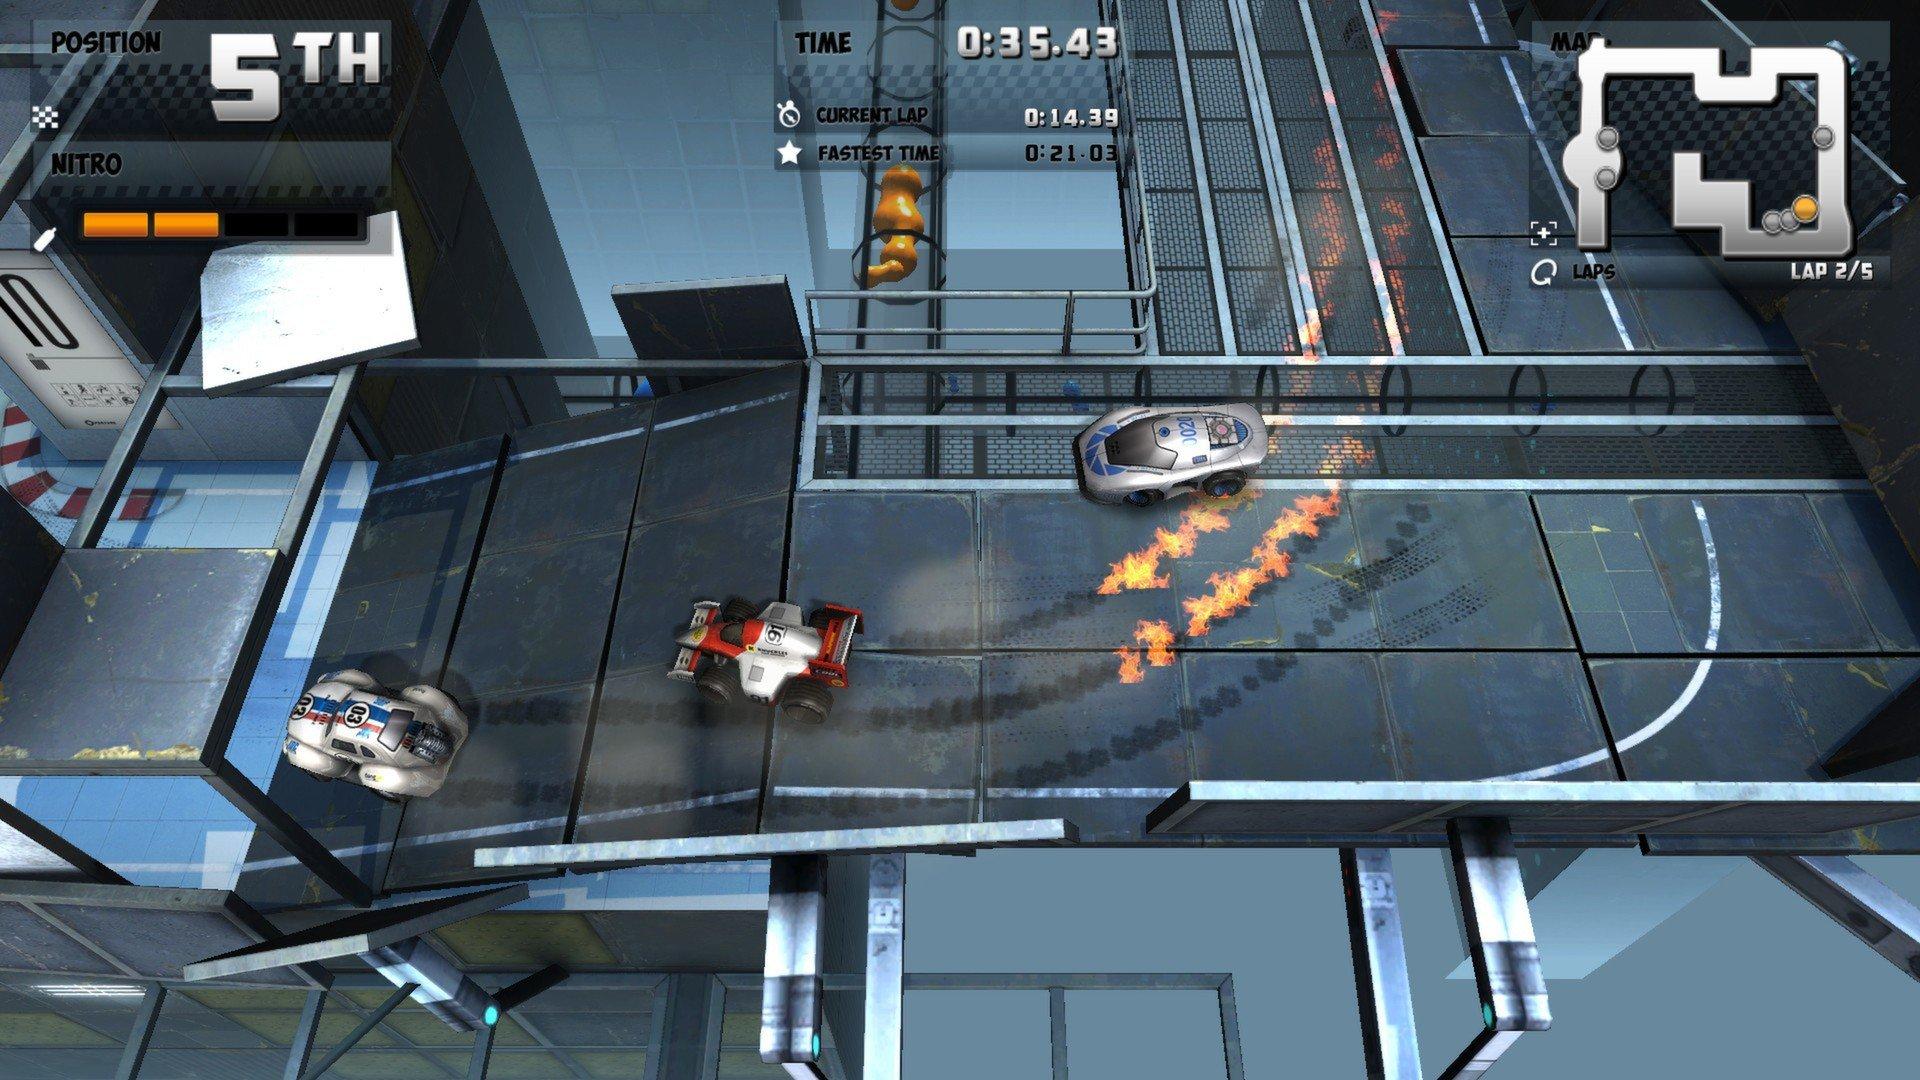 Mini Motor Racing EVO - картинки, скриншоты и фото из игры Mini Motor Racing EVO Канобу